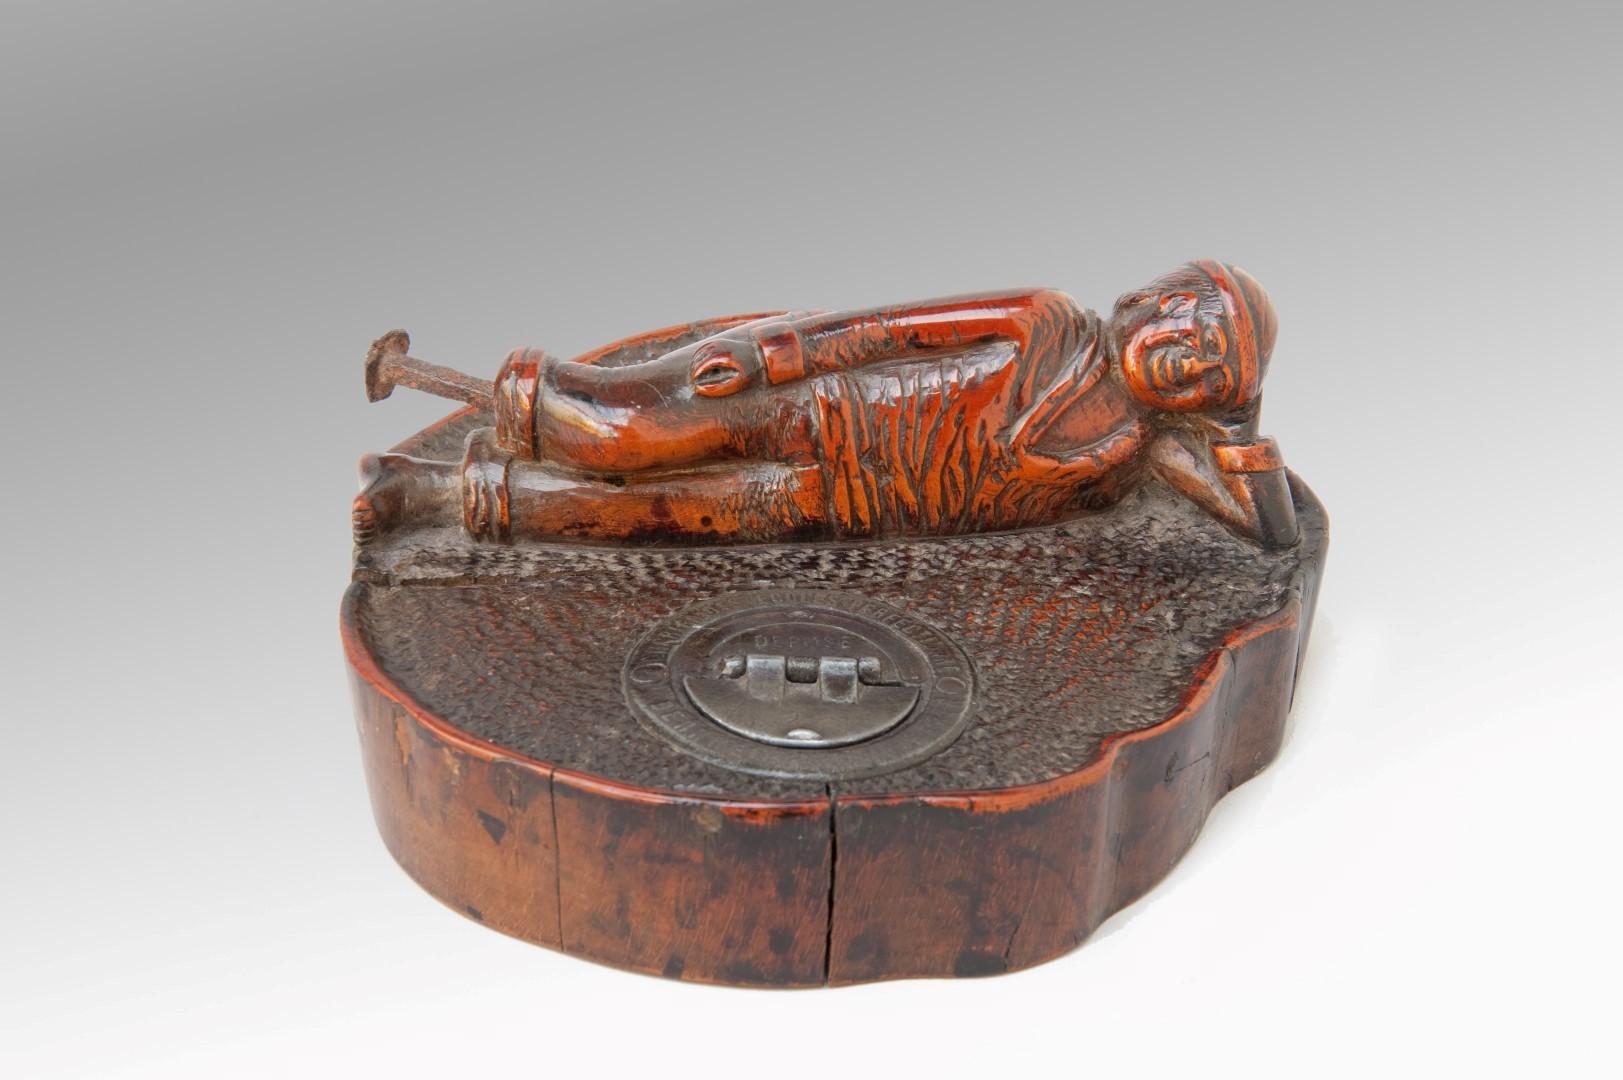 Image of Cherry-wood Inkwell